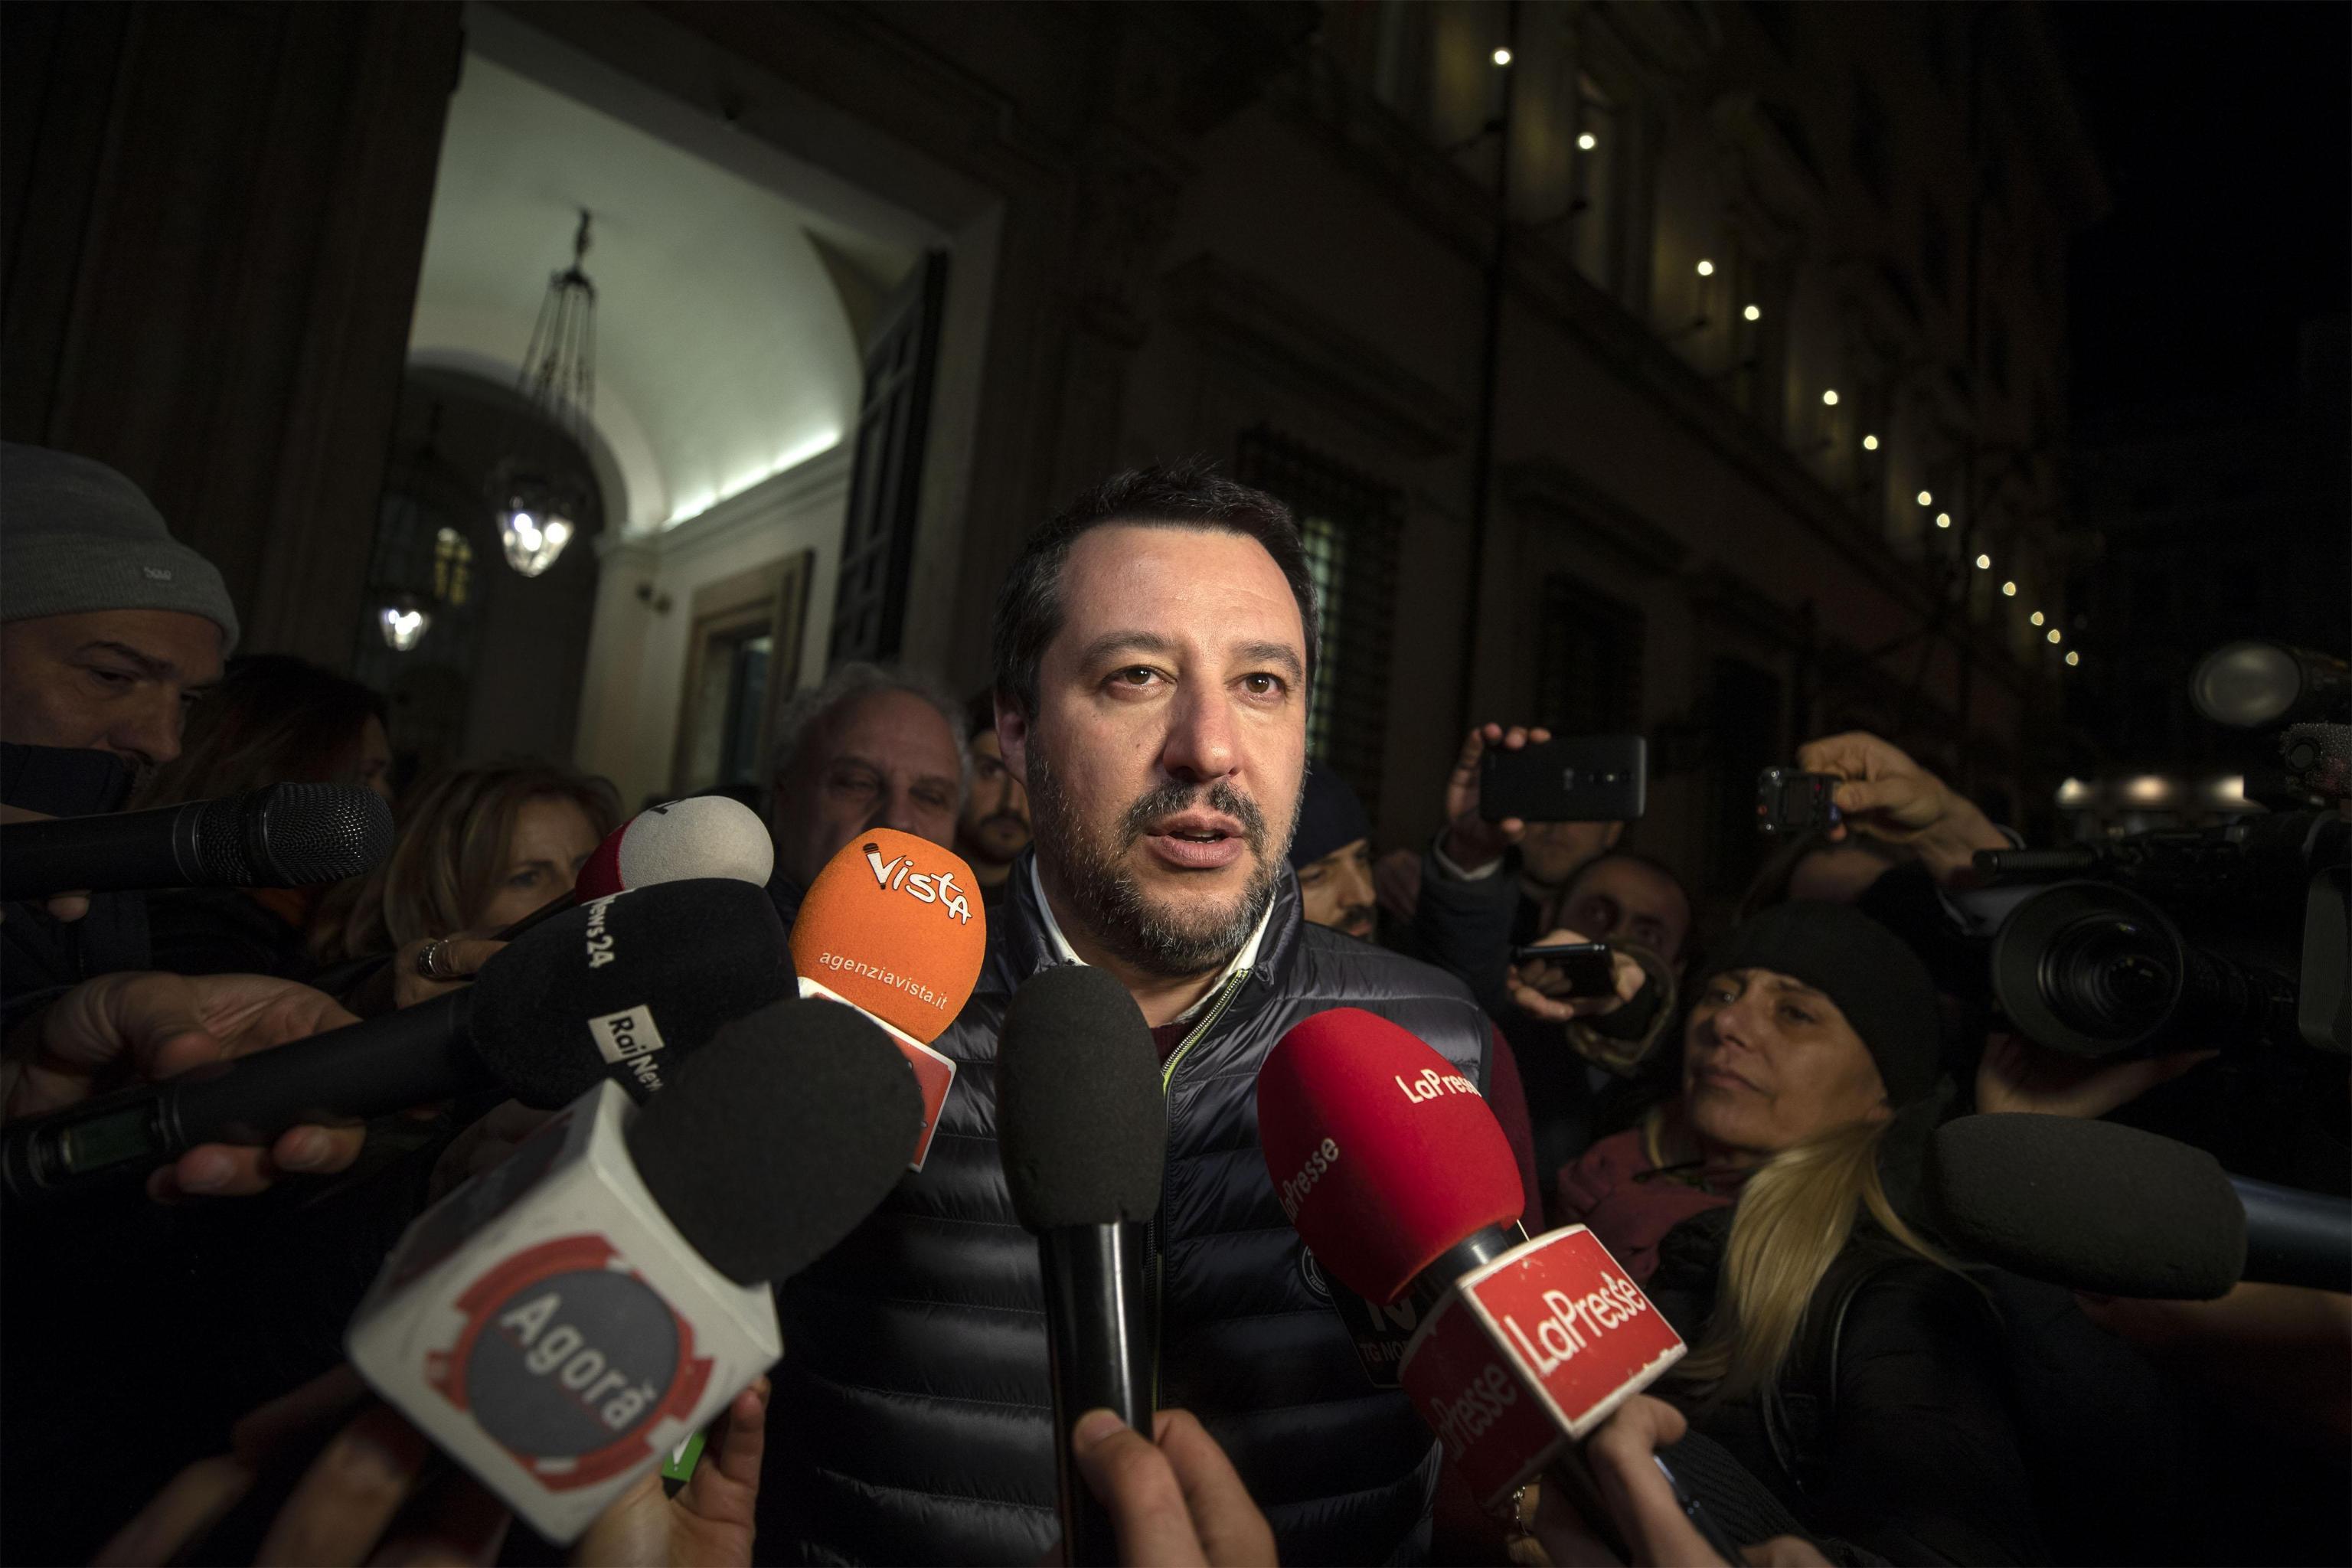 ++ Autonomia: Salvini, no cittadini serie A e B ++